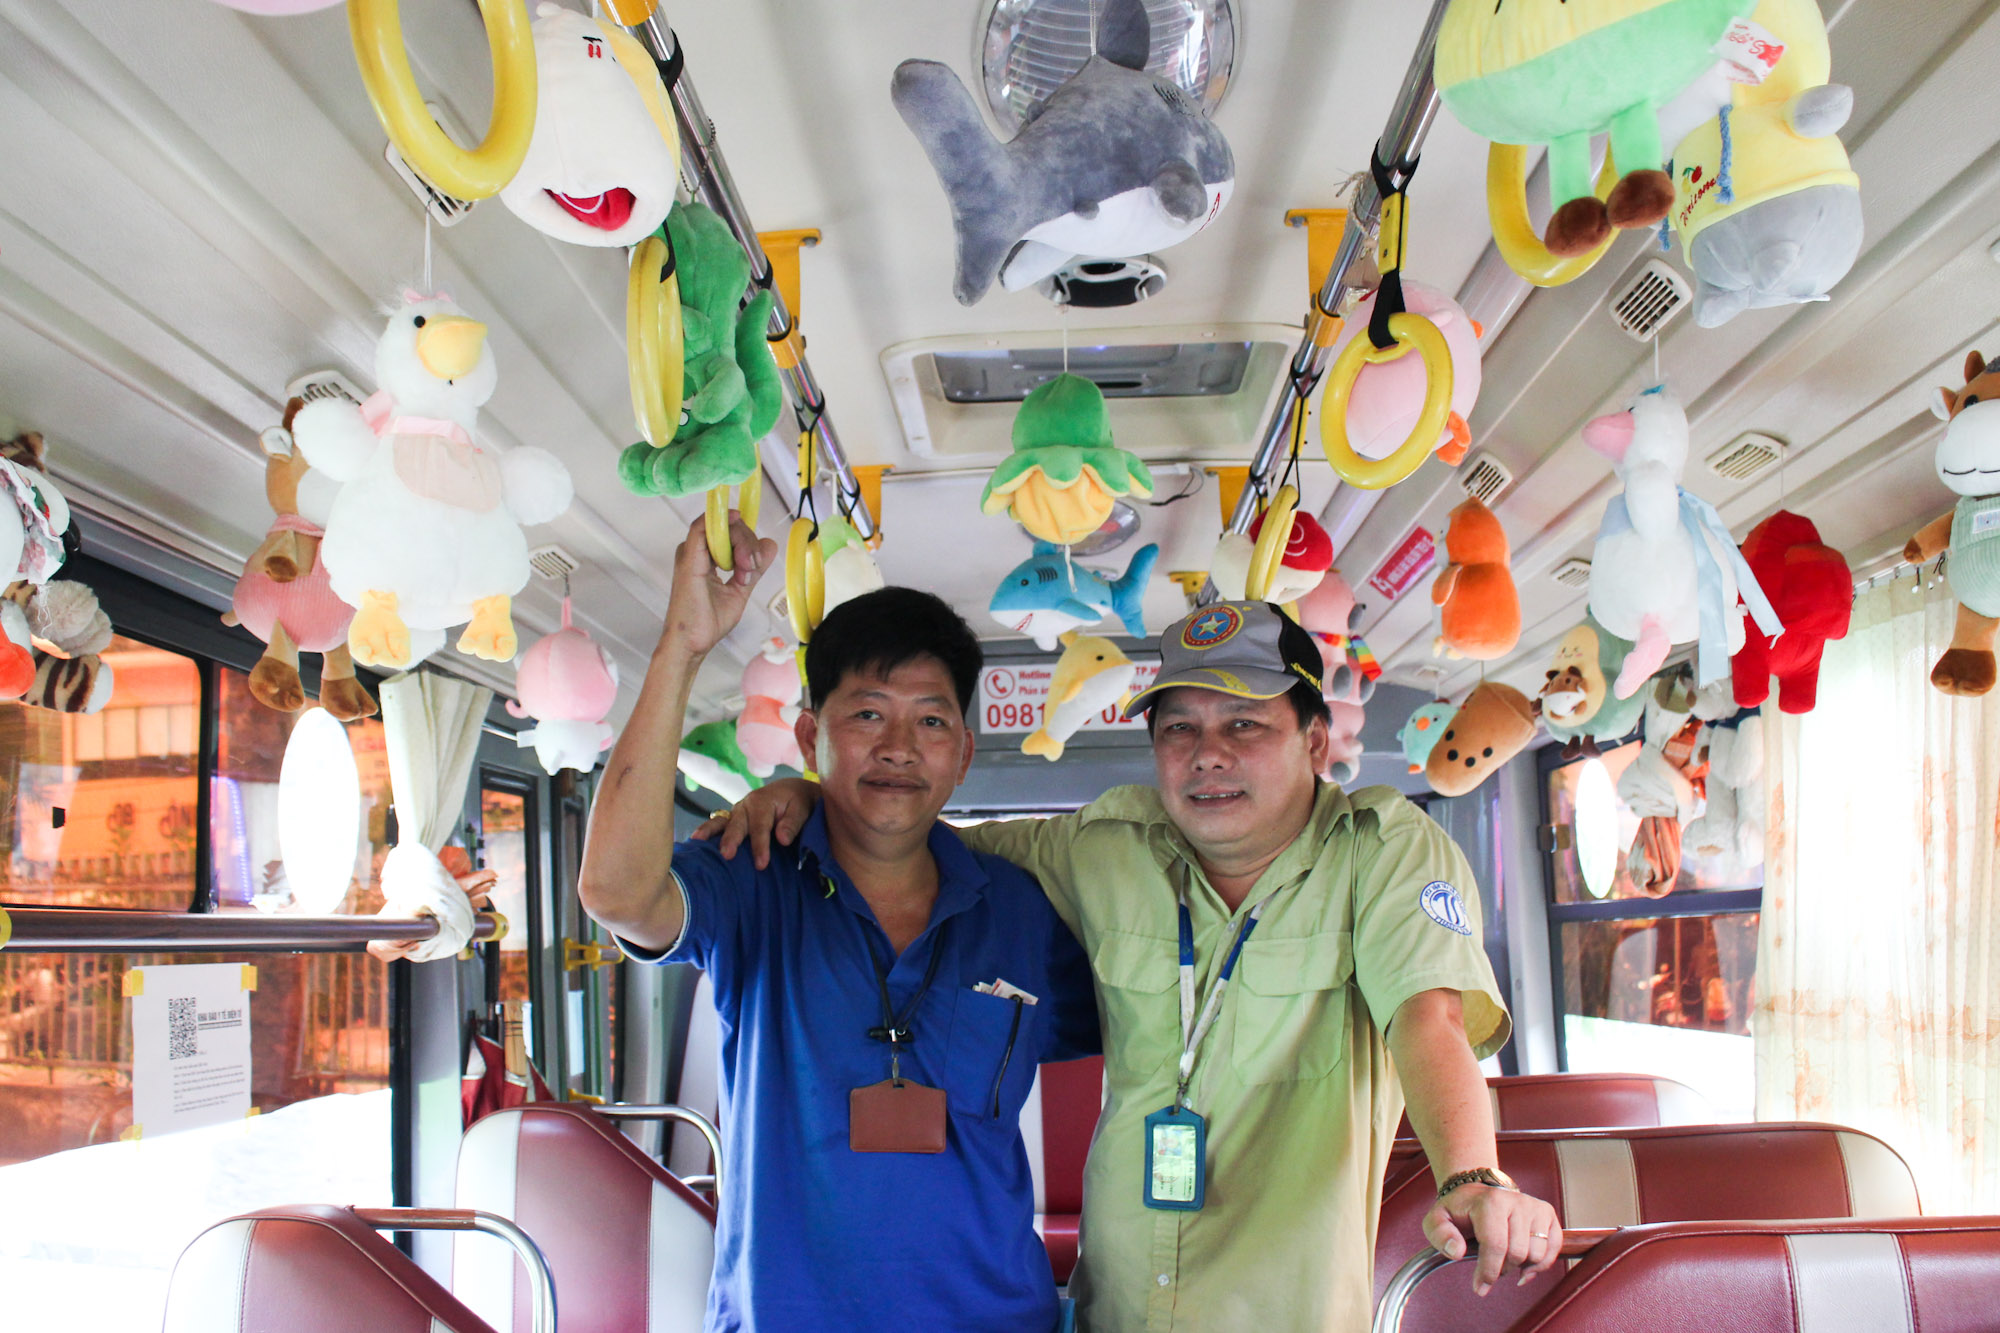 Pham Van Sang (L) and Pham Ngoc Tuyen (R) posing for photo in the Bus 146. Photo by VnExpress/Diep Phan.